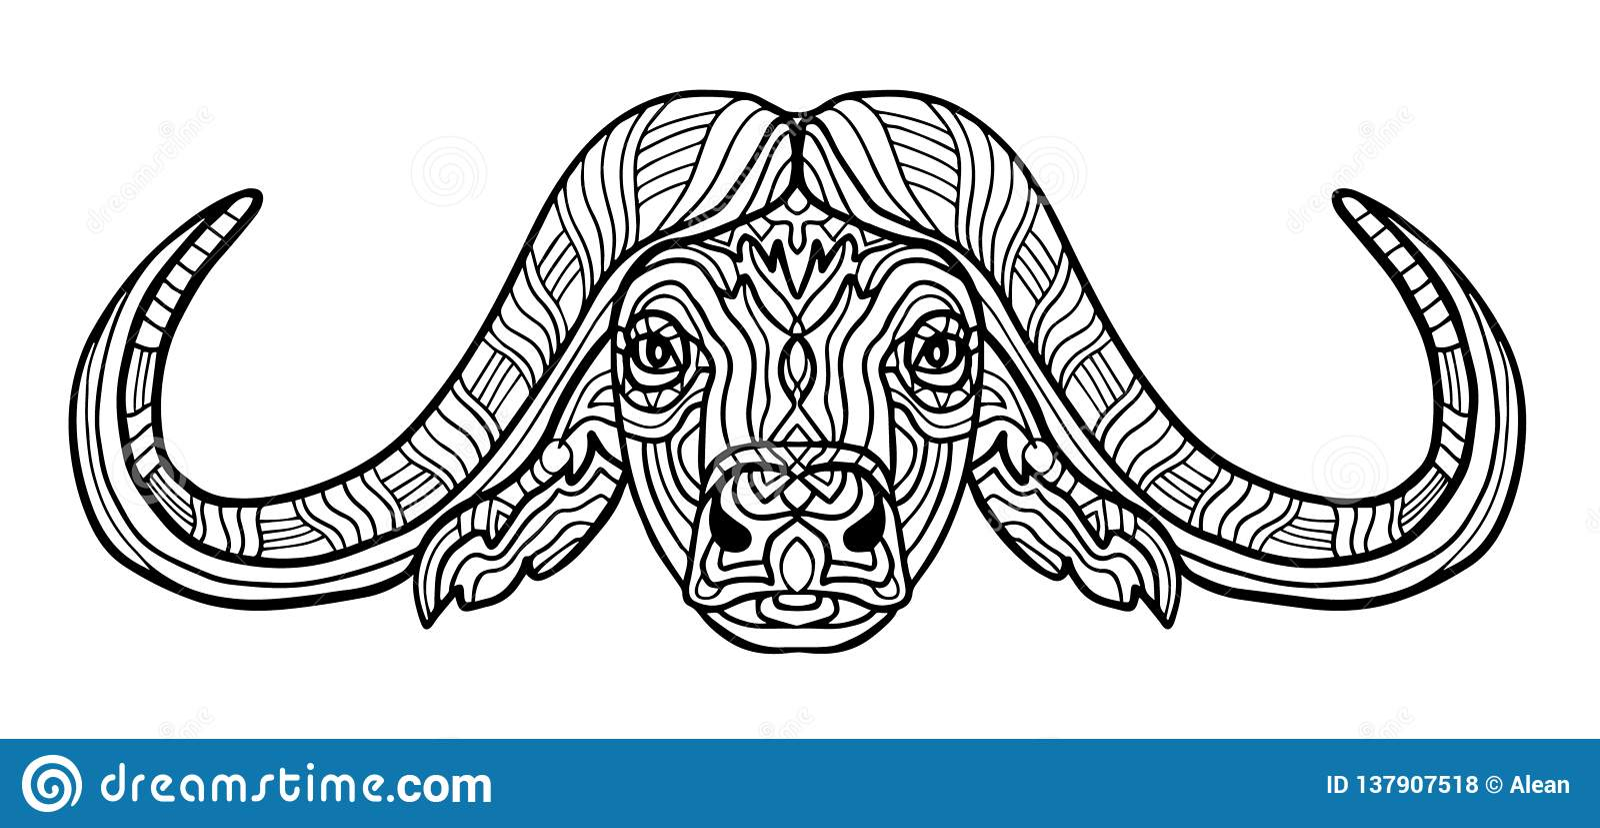 Buffalo Animal Coloring Book For Adults Raster Illustration ...